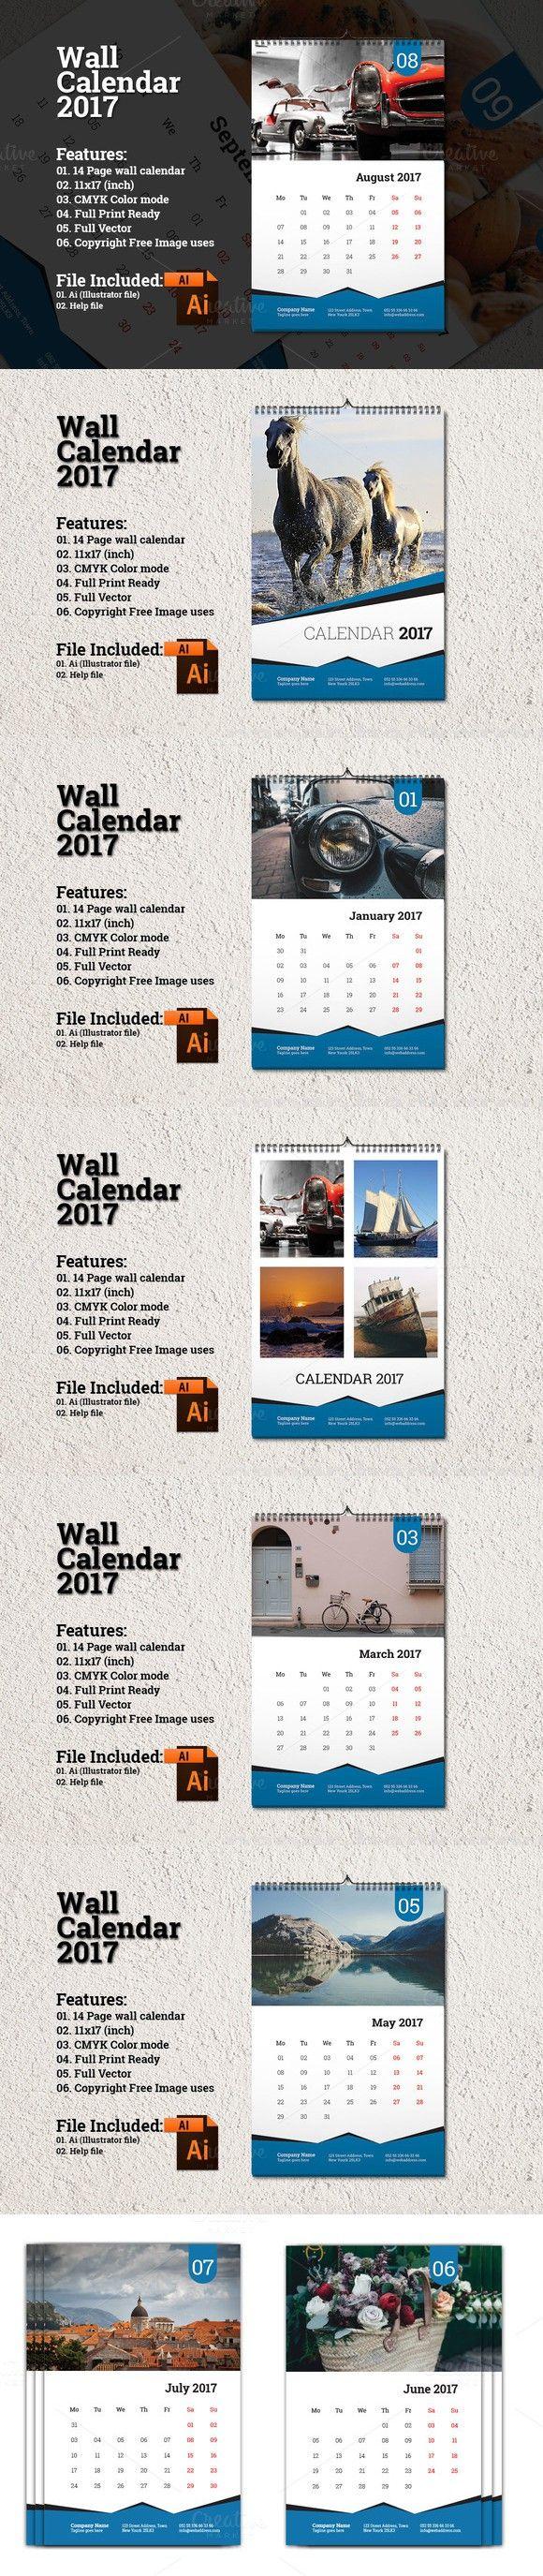 the 15 best calendars images on pinterest calendar templates